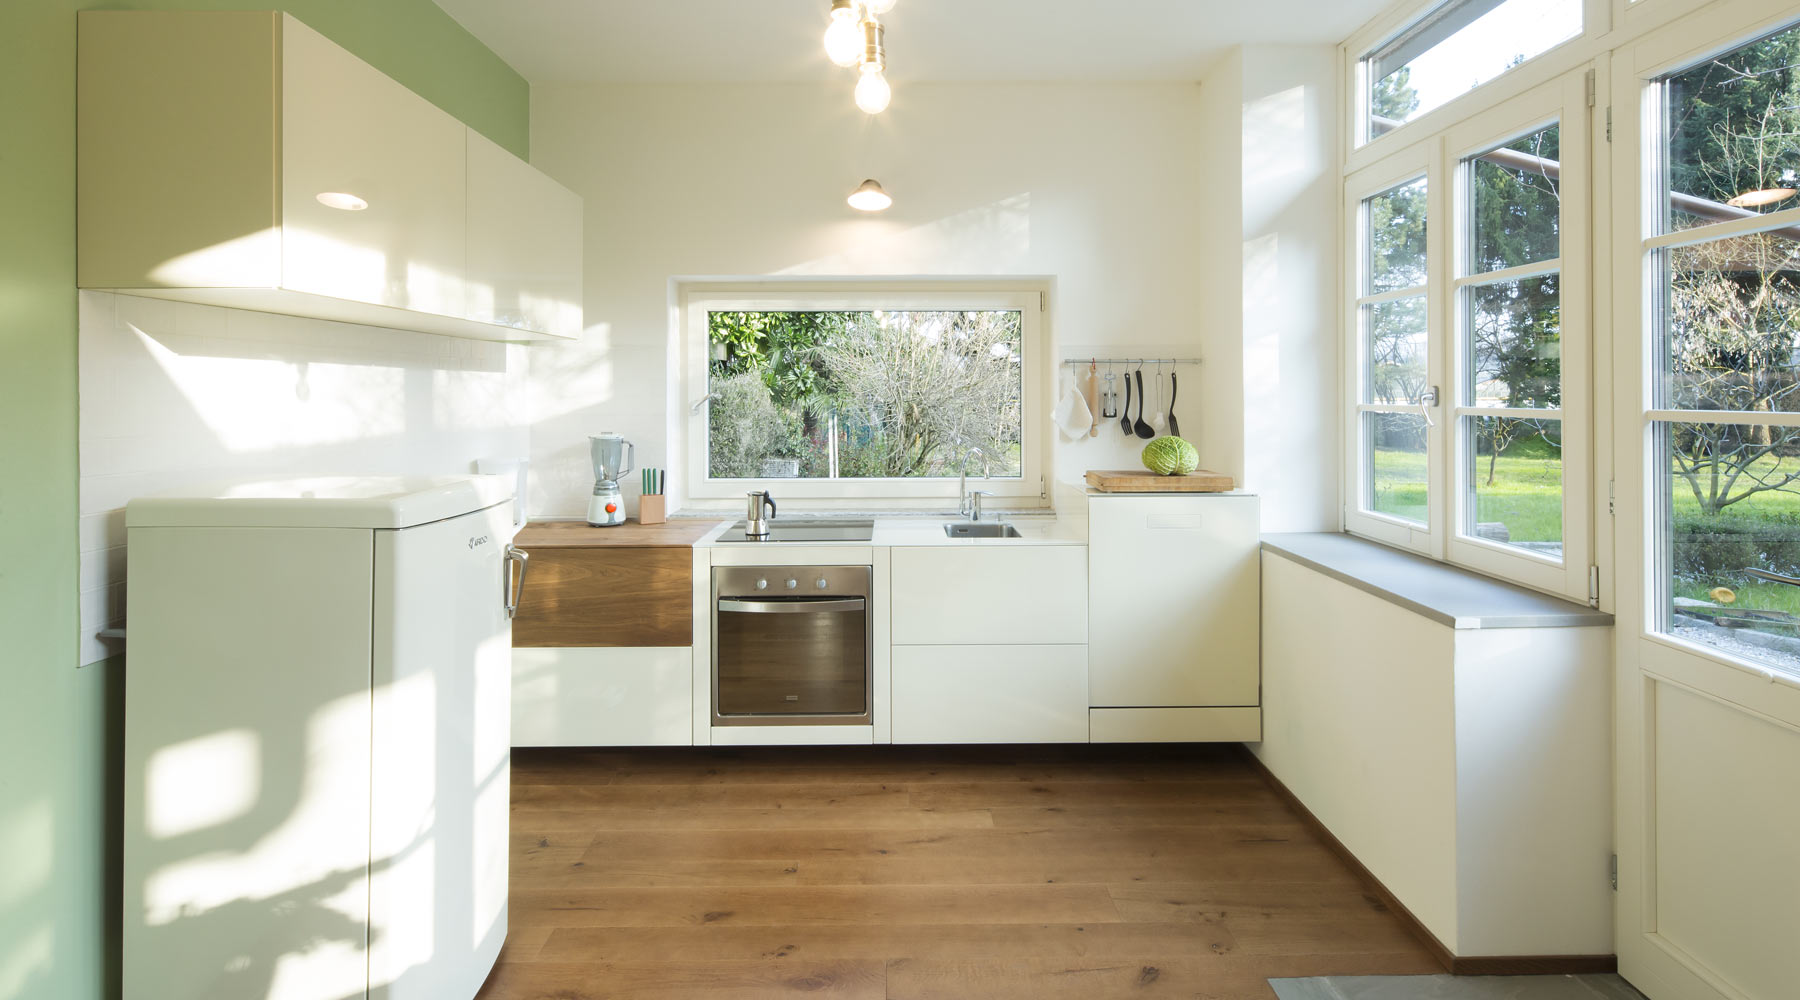 lago-welcome-nel-verde-cucina-di-design